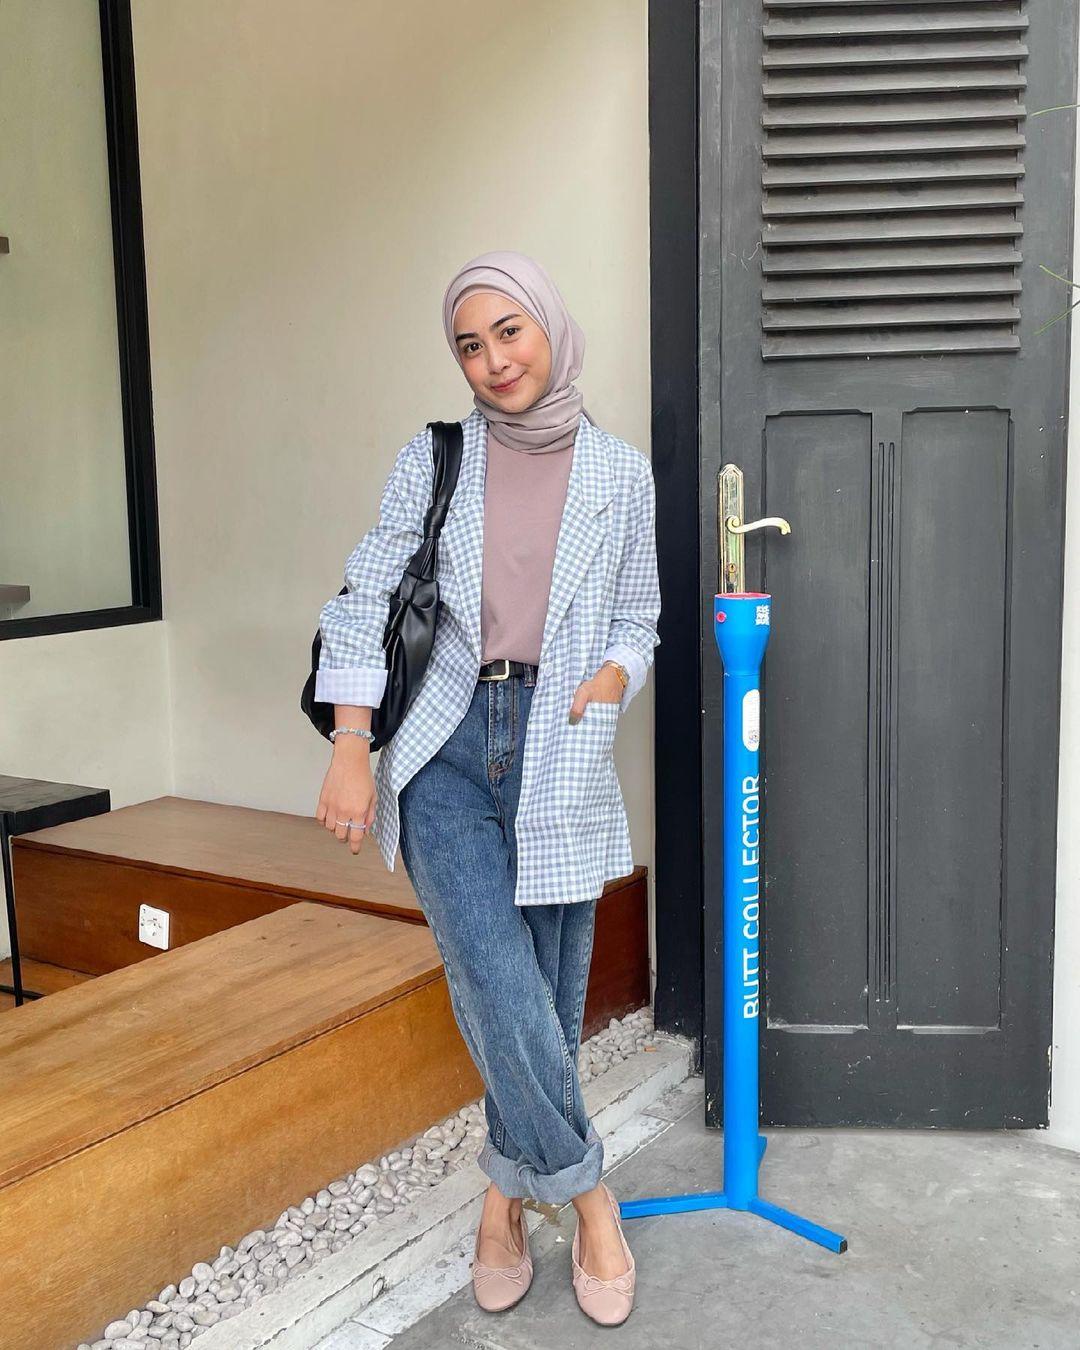 Cara Membuat Gaya Blazer Agar Terlihat Seperti Jilbab yang Modis